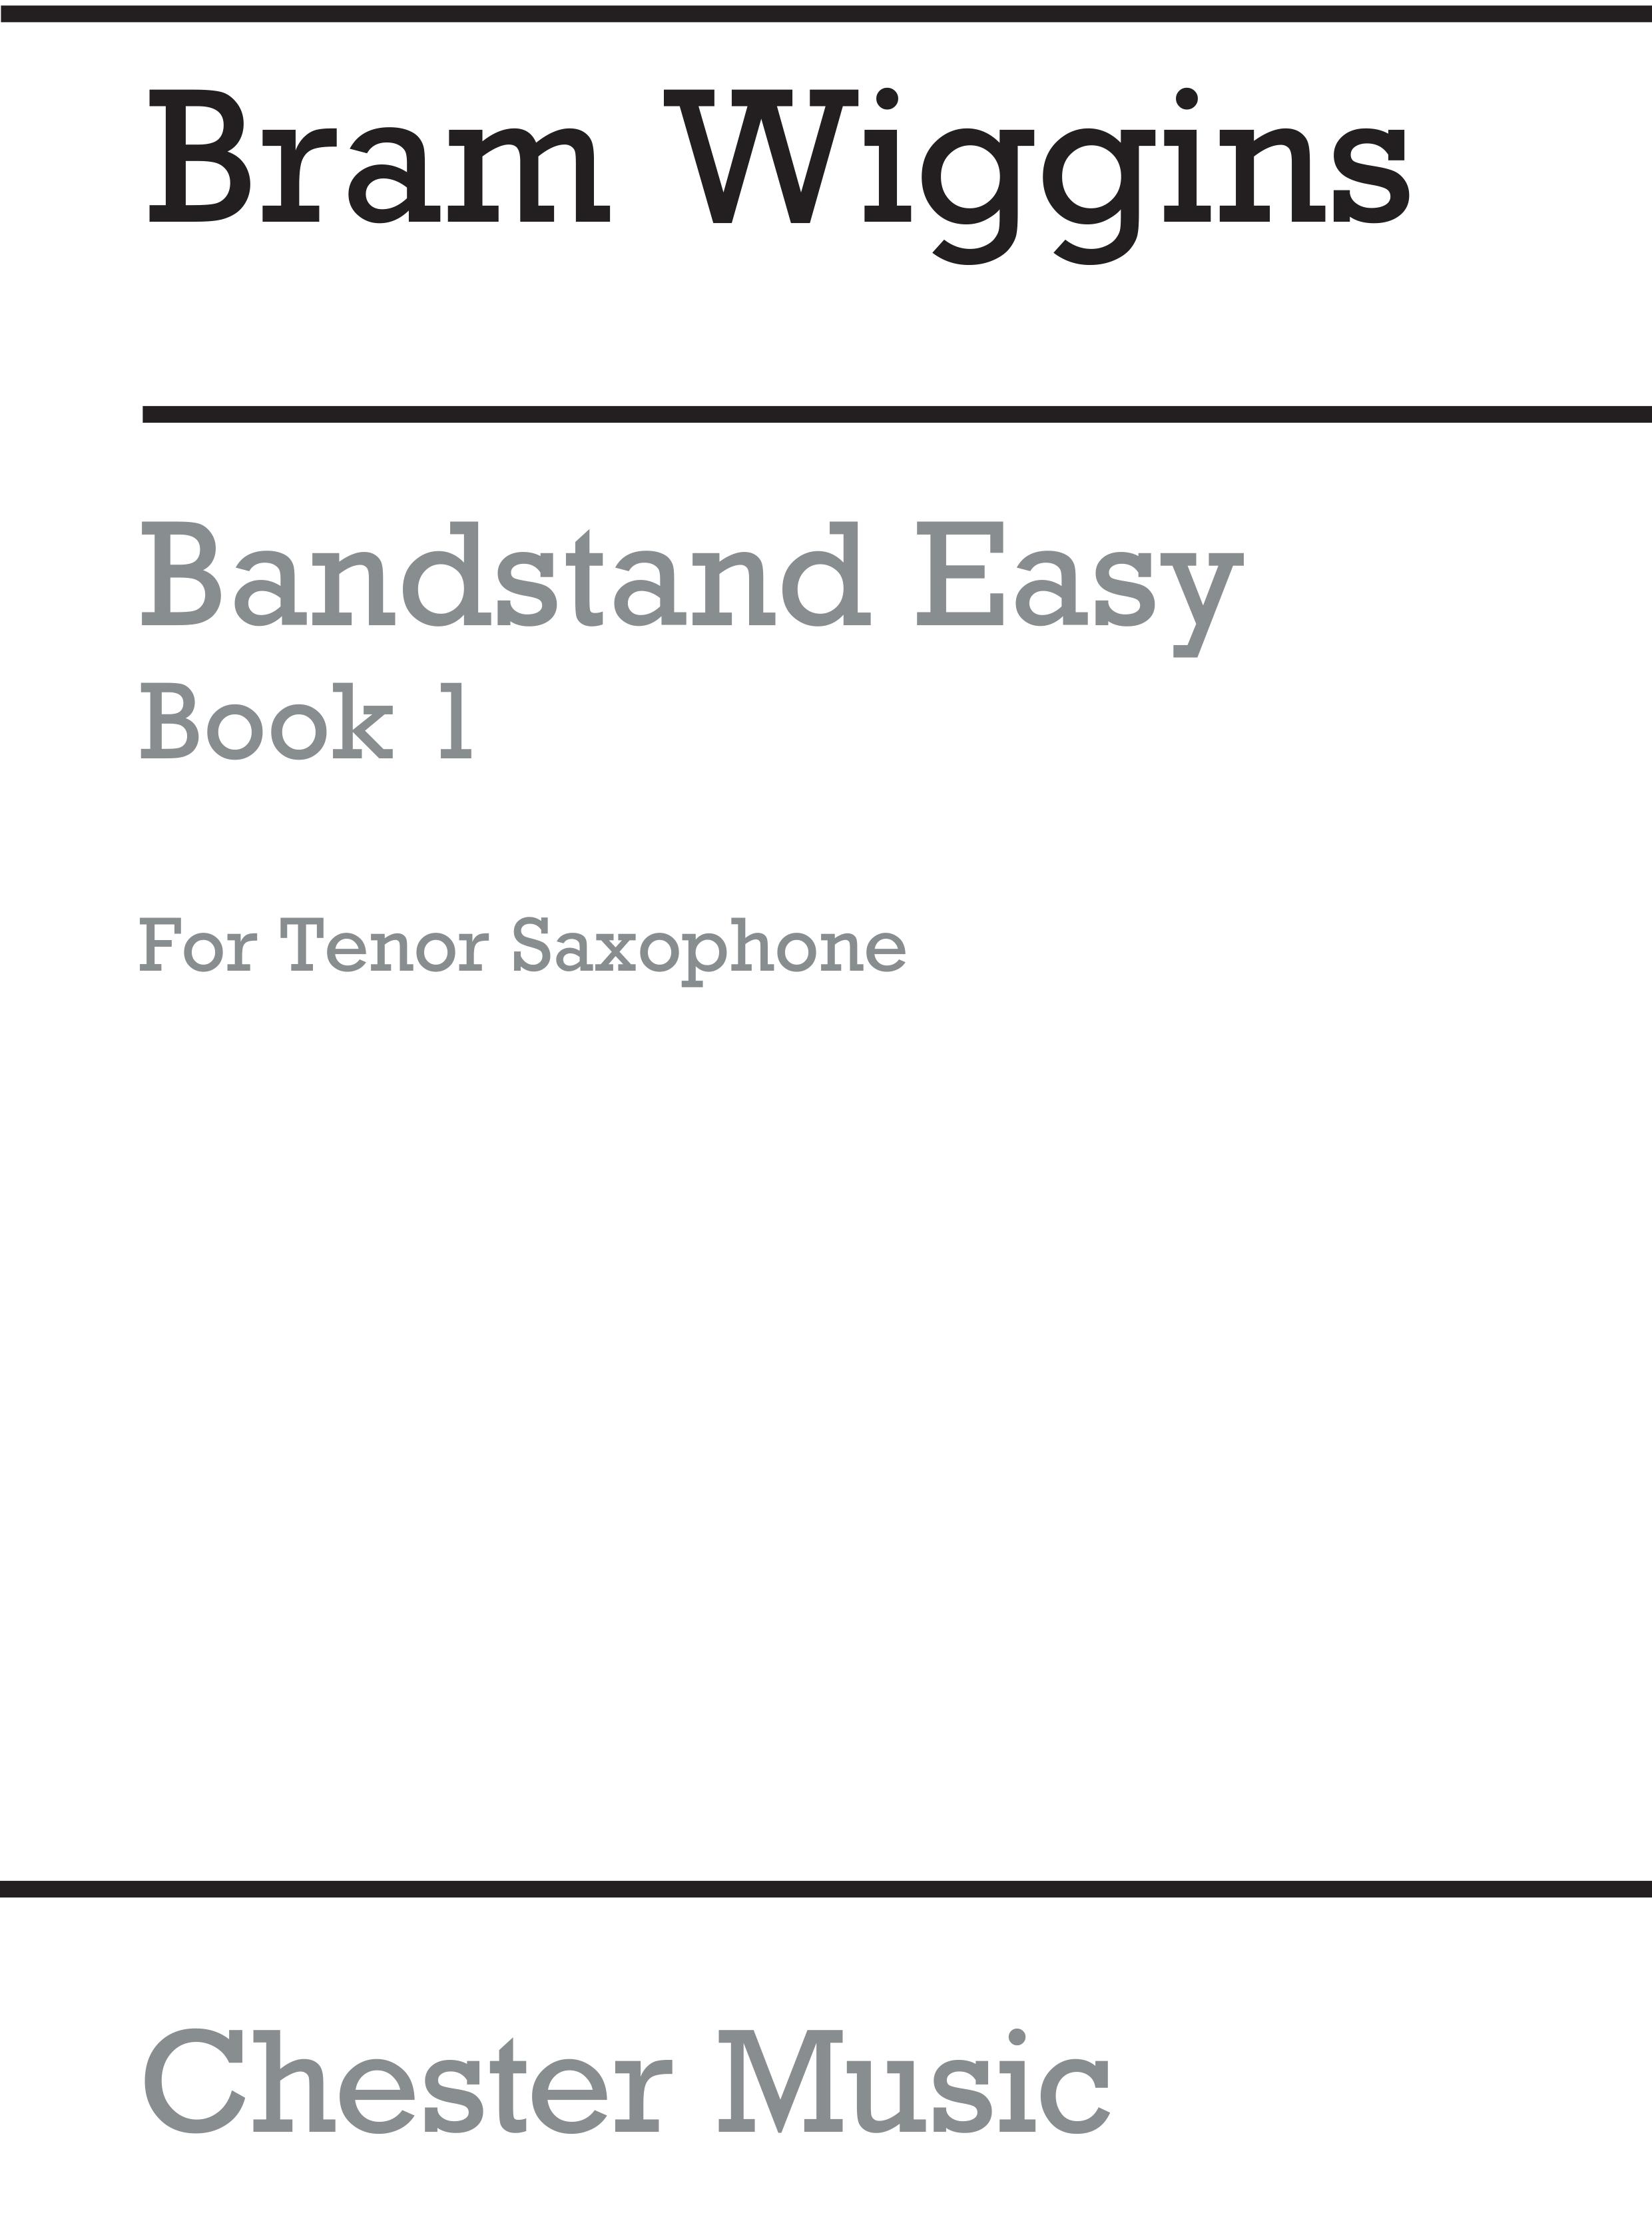 Bram Wiggins: Bandstand Easy Book 1 (Tenor Saxophone): Concert Band: Part